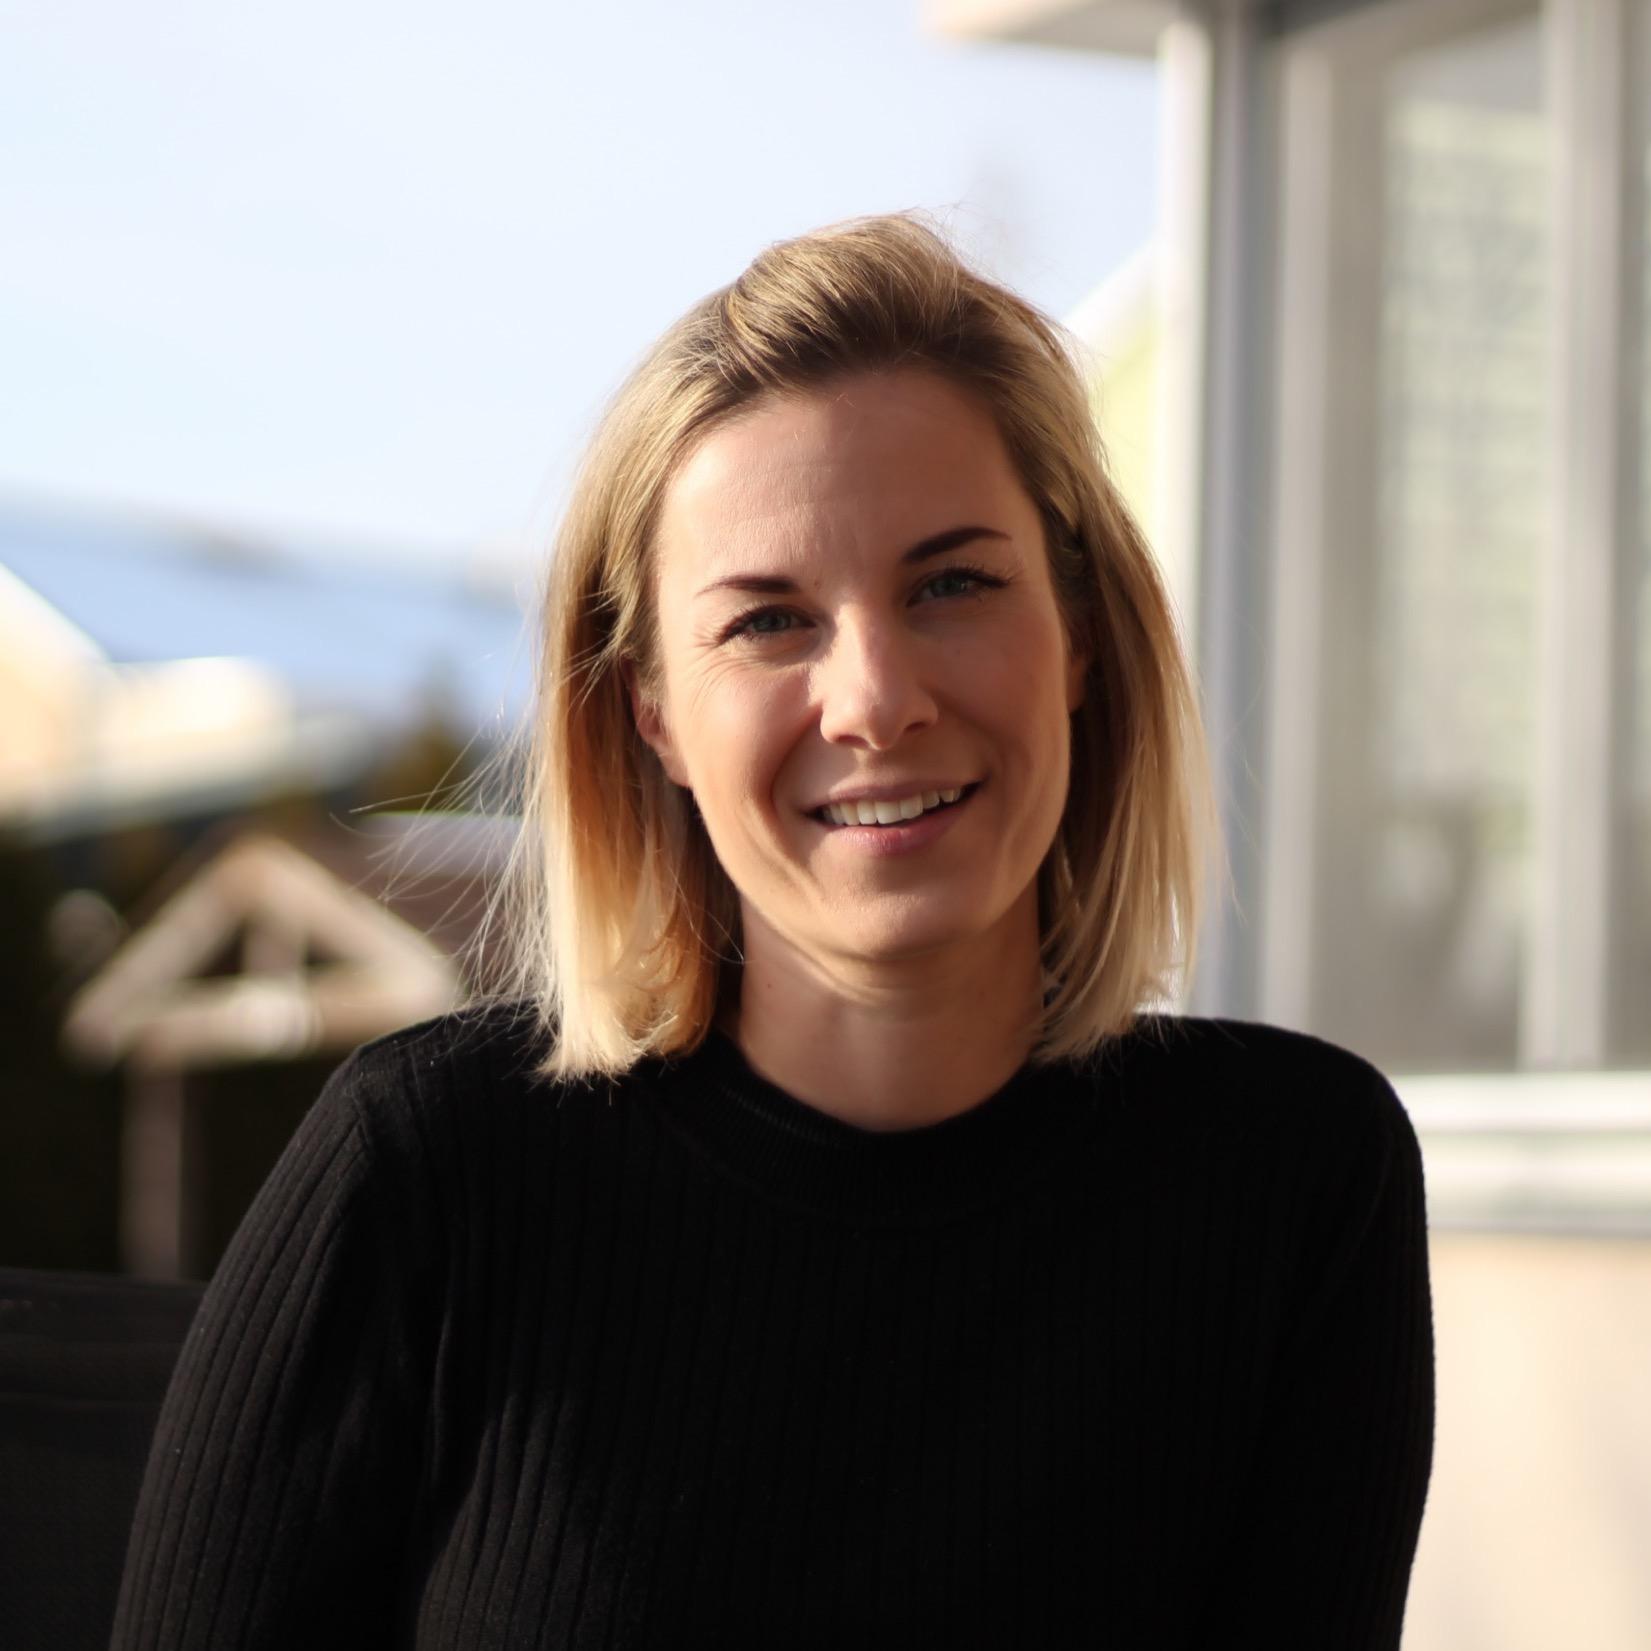 Ernährungs- & Mentaltrainerin Martina Hierzer